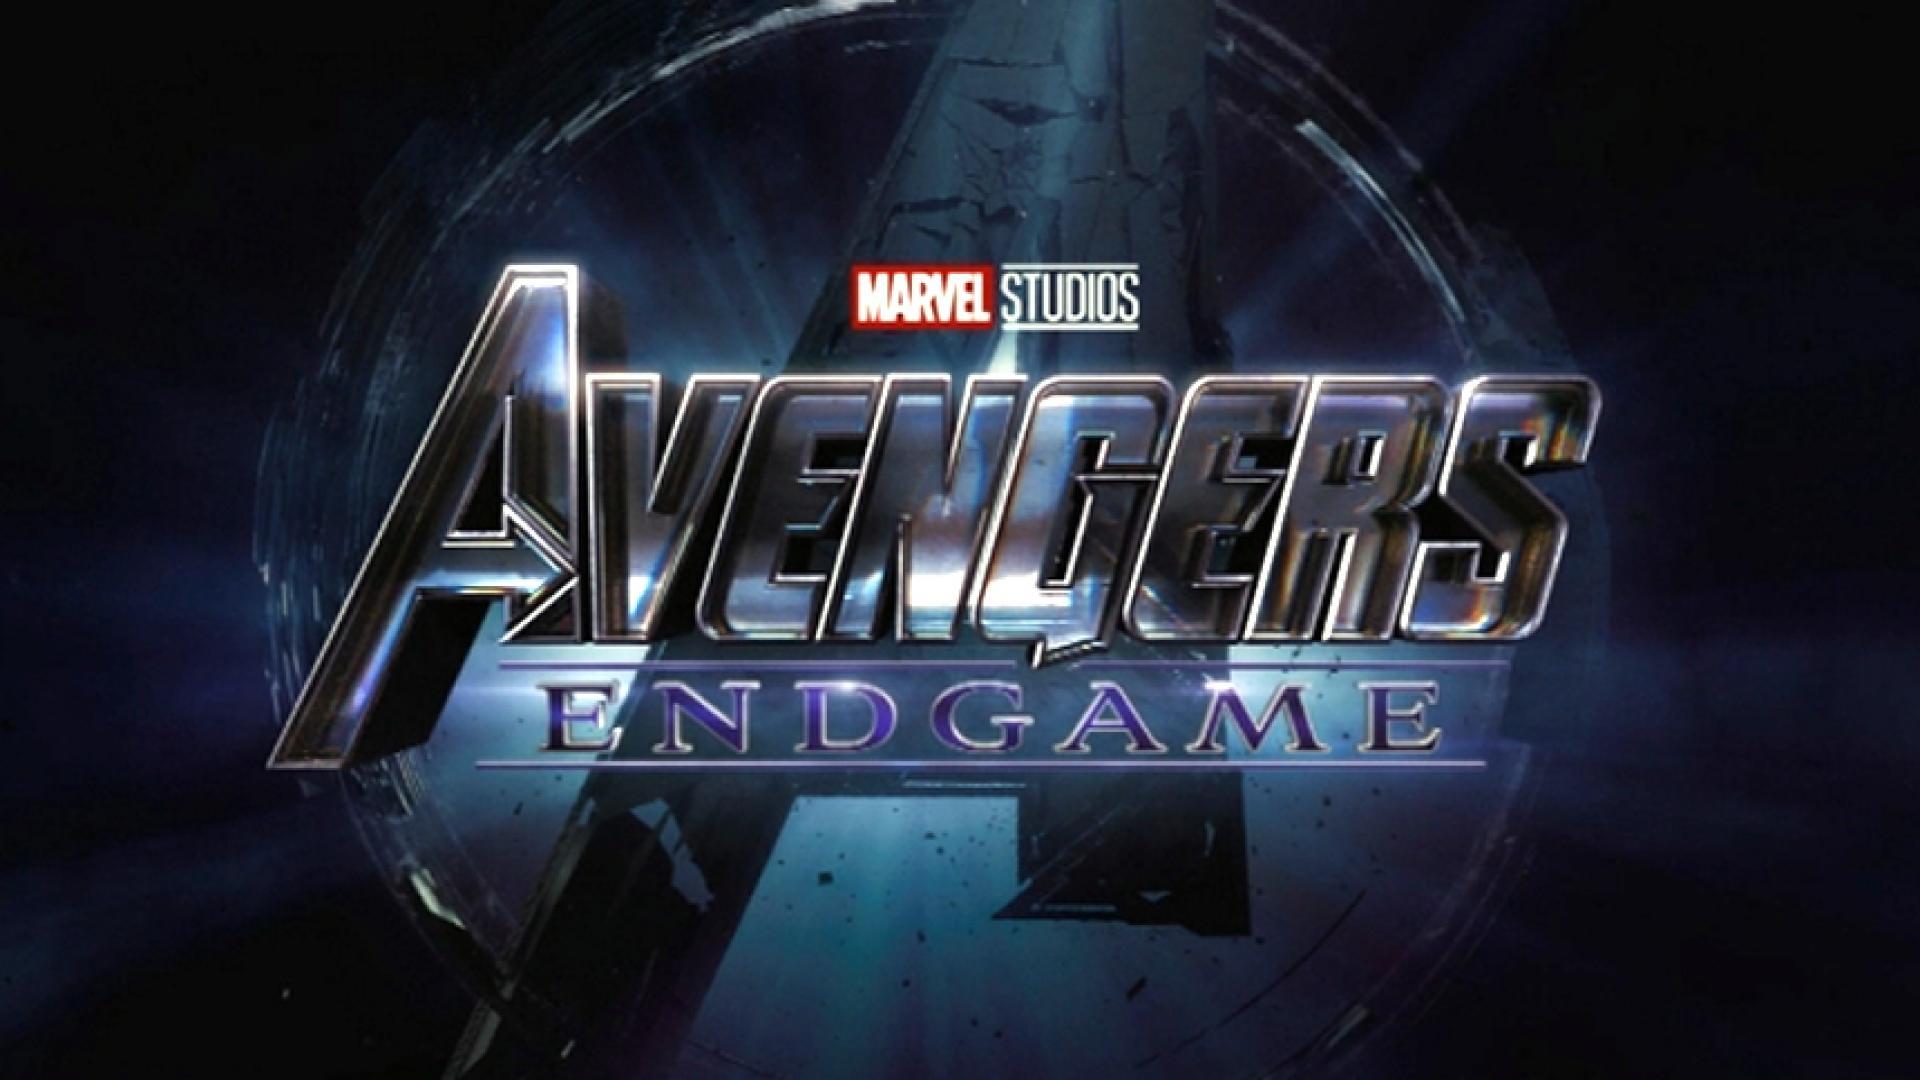 NC_avengers_1920x1080_1556215344187.jpg